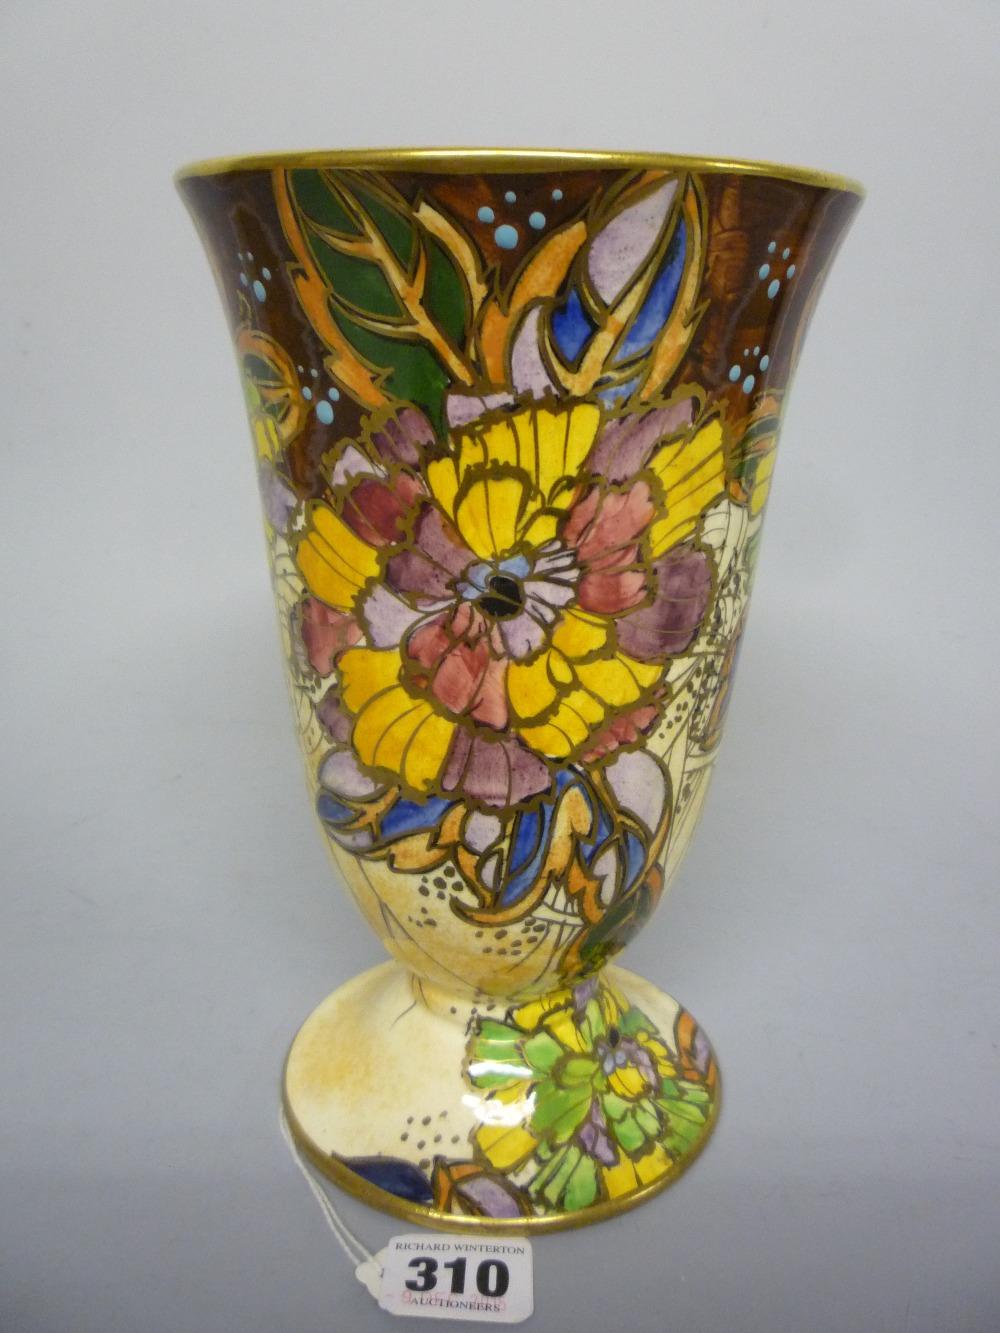 Royal winton grimwades art deco lustre vase floral decoration no lot 310 royal winton grimwades art deco lustre vase floral decoration no 2322 reviewsmspy